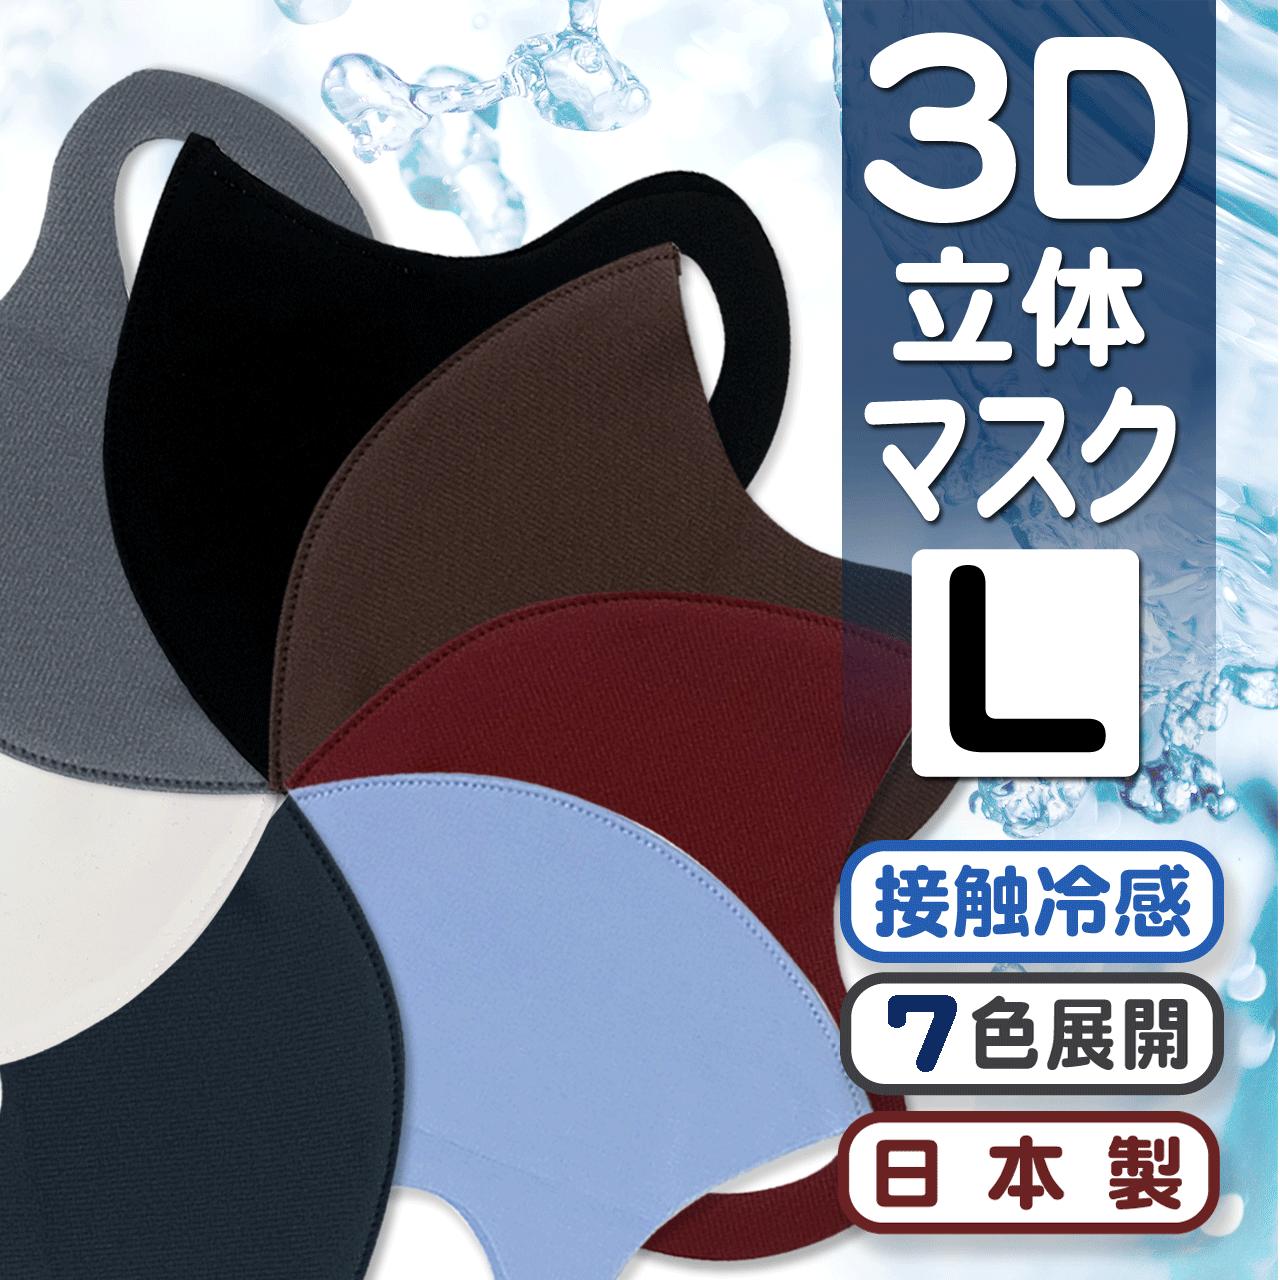 3D立体カラーマスクLサイズ